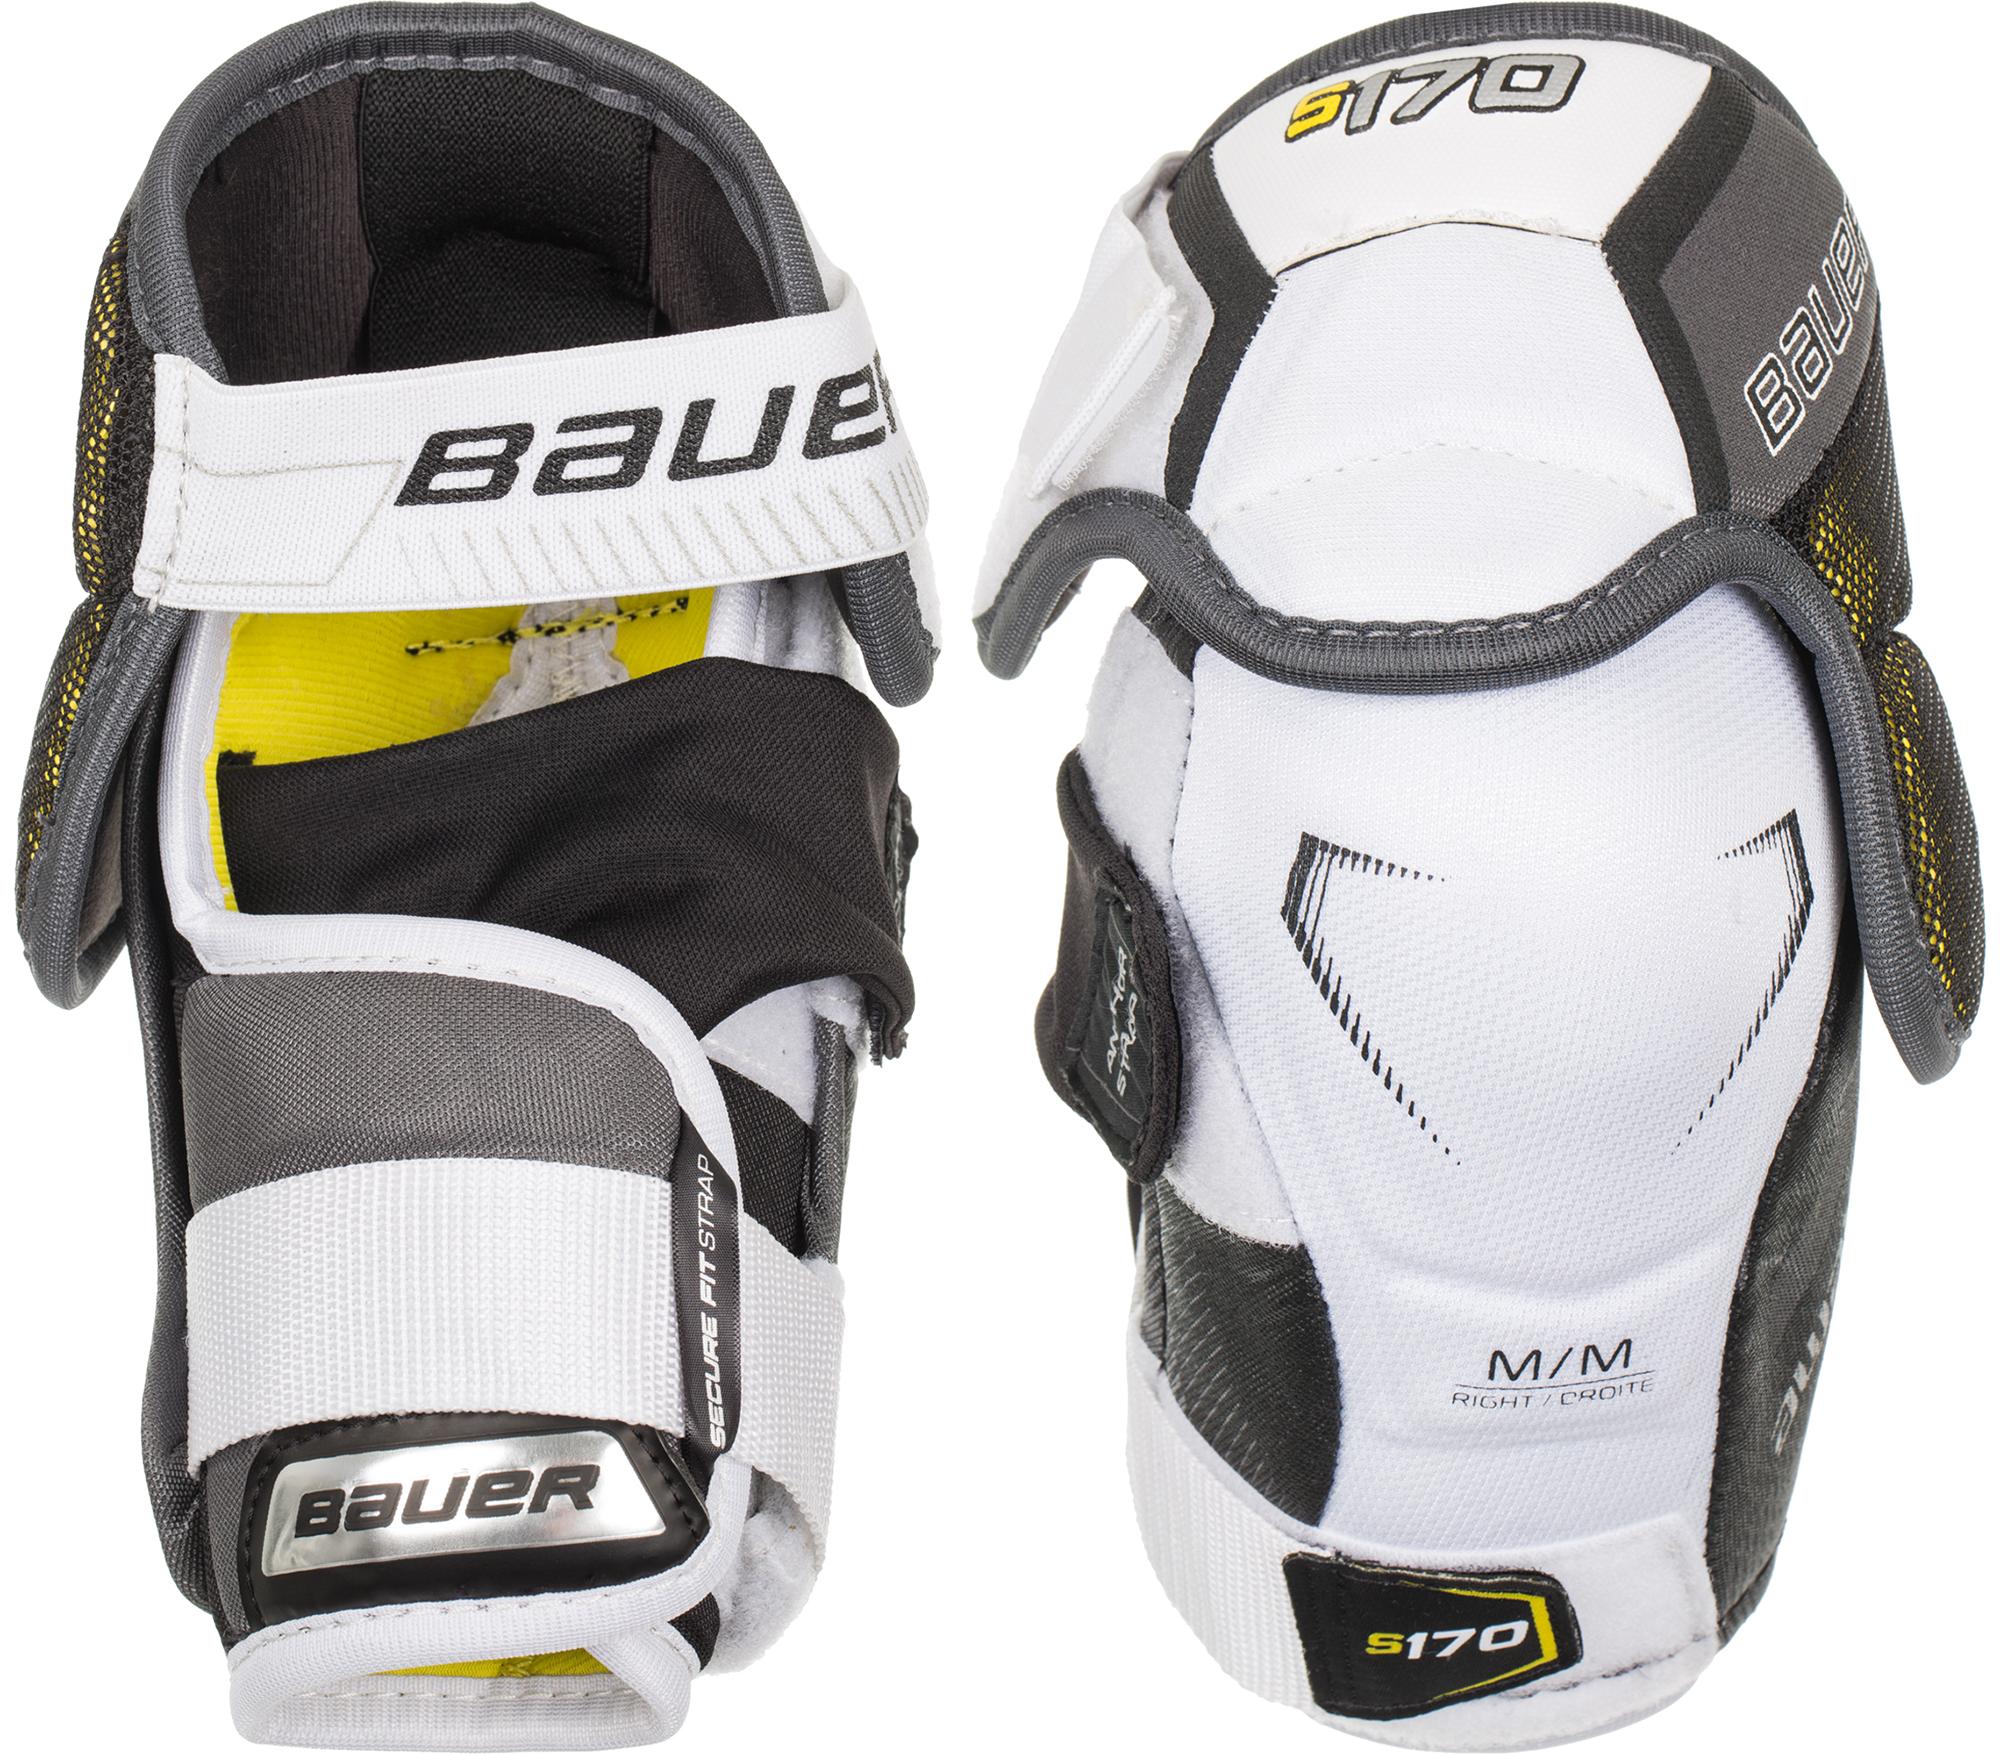 Bauer Налокотники хоккейные детские Bauer S17 Supreme S170, размер L